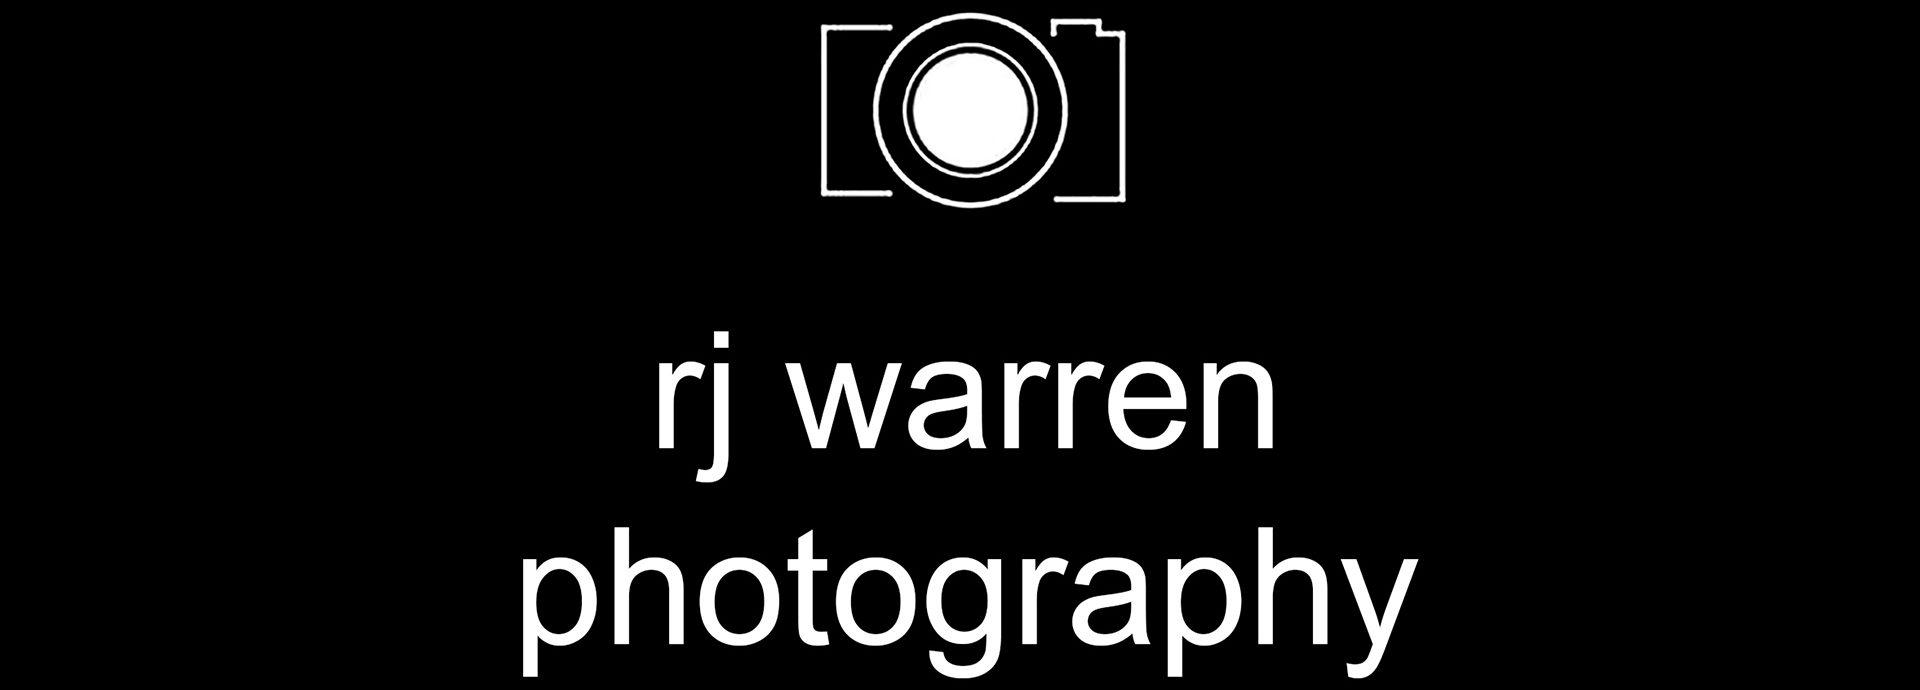 rj warren photography